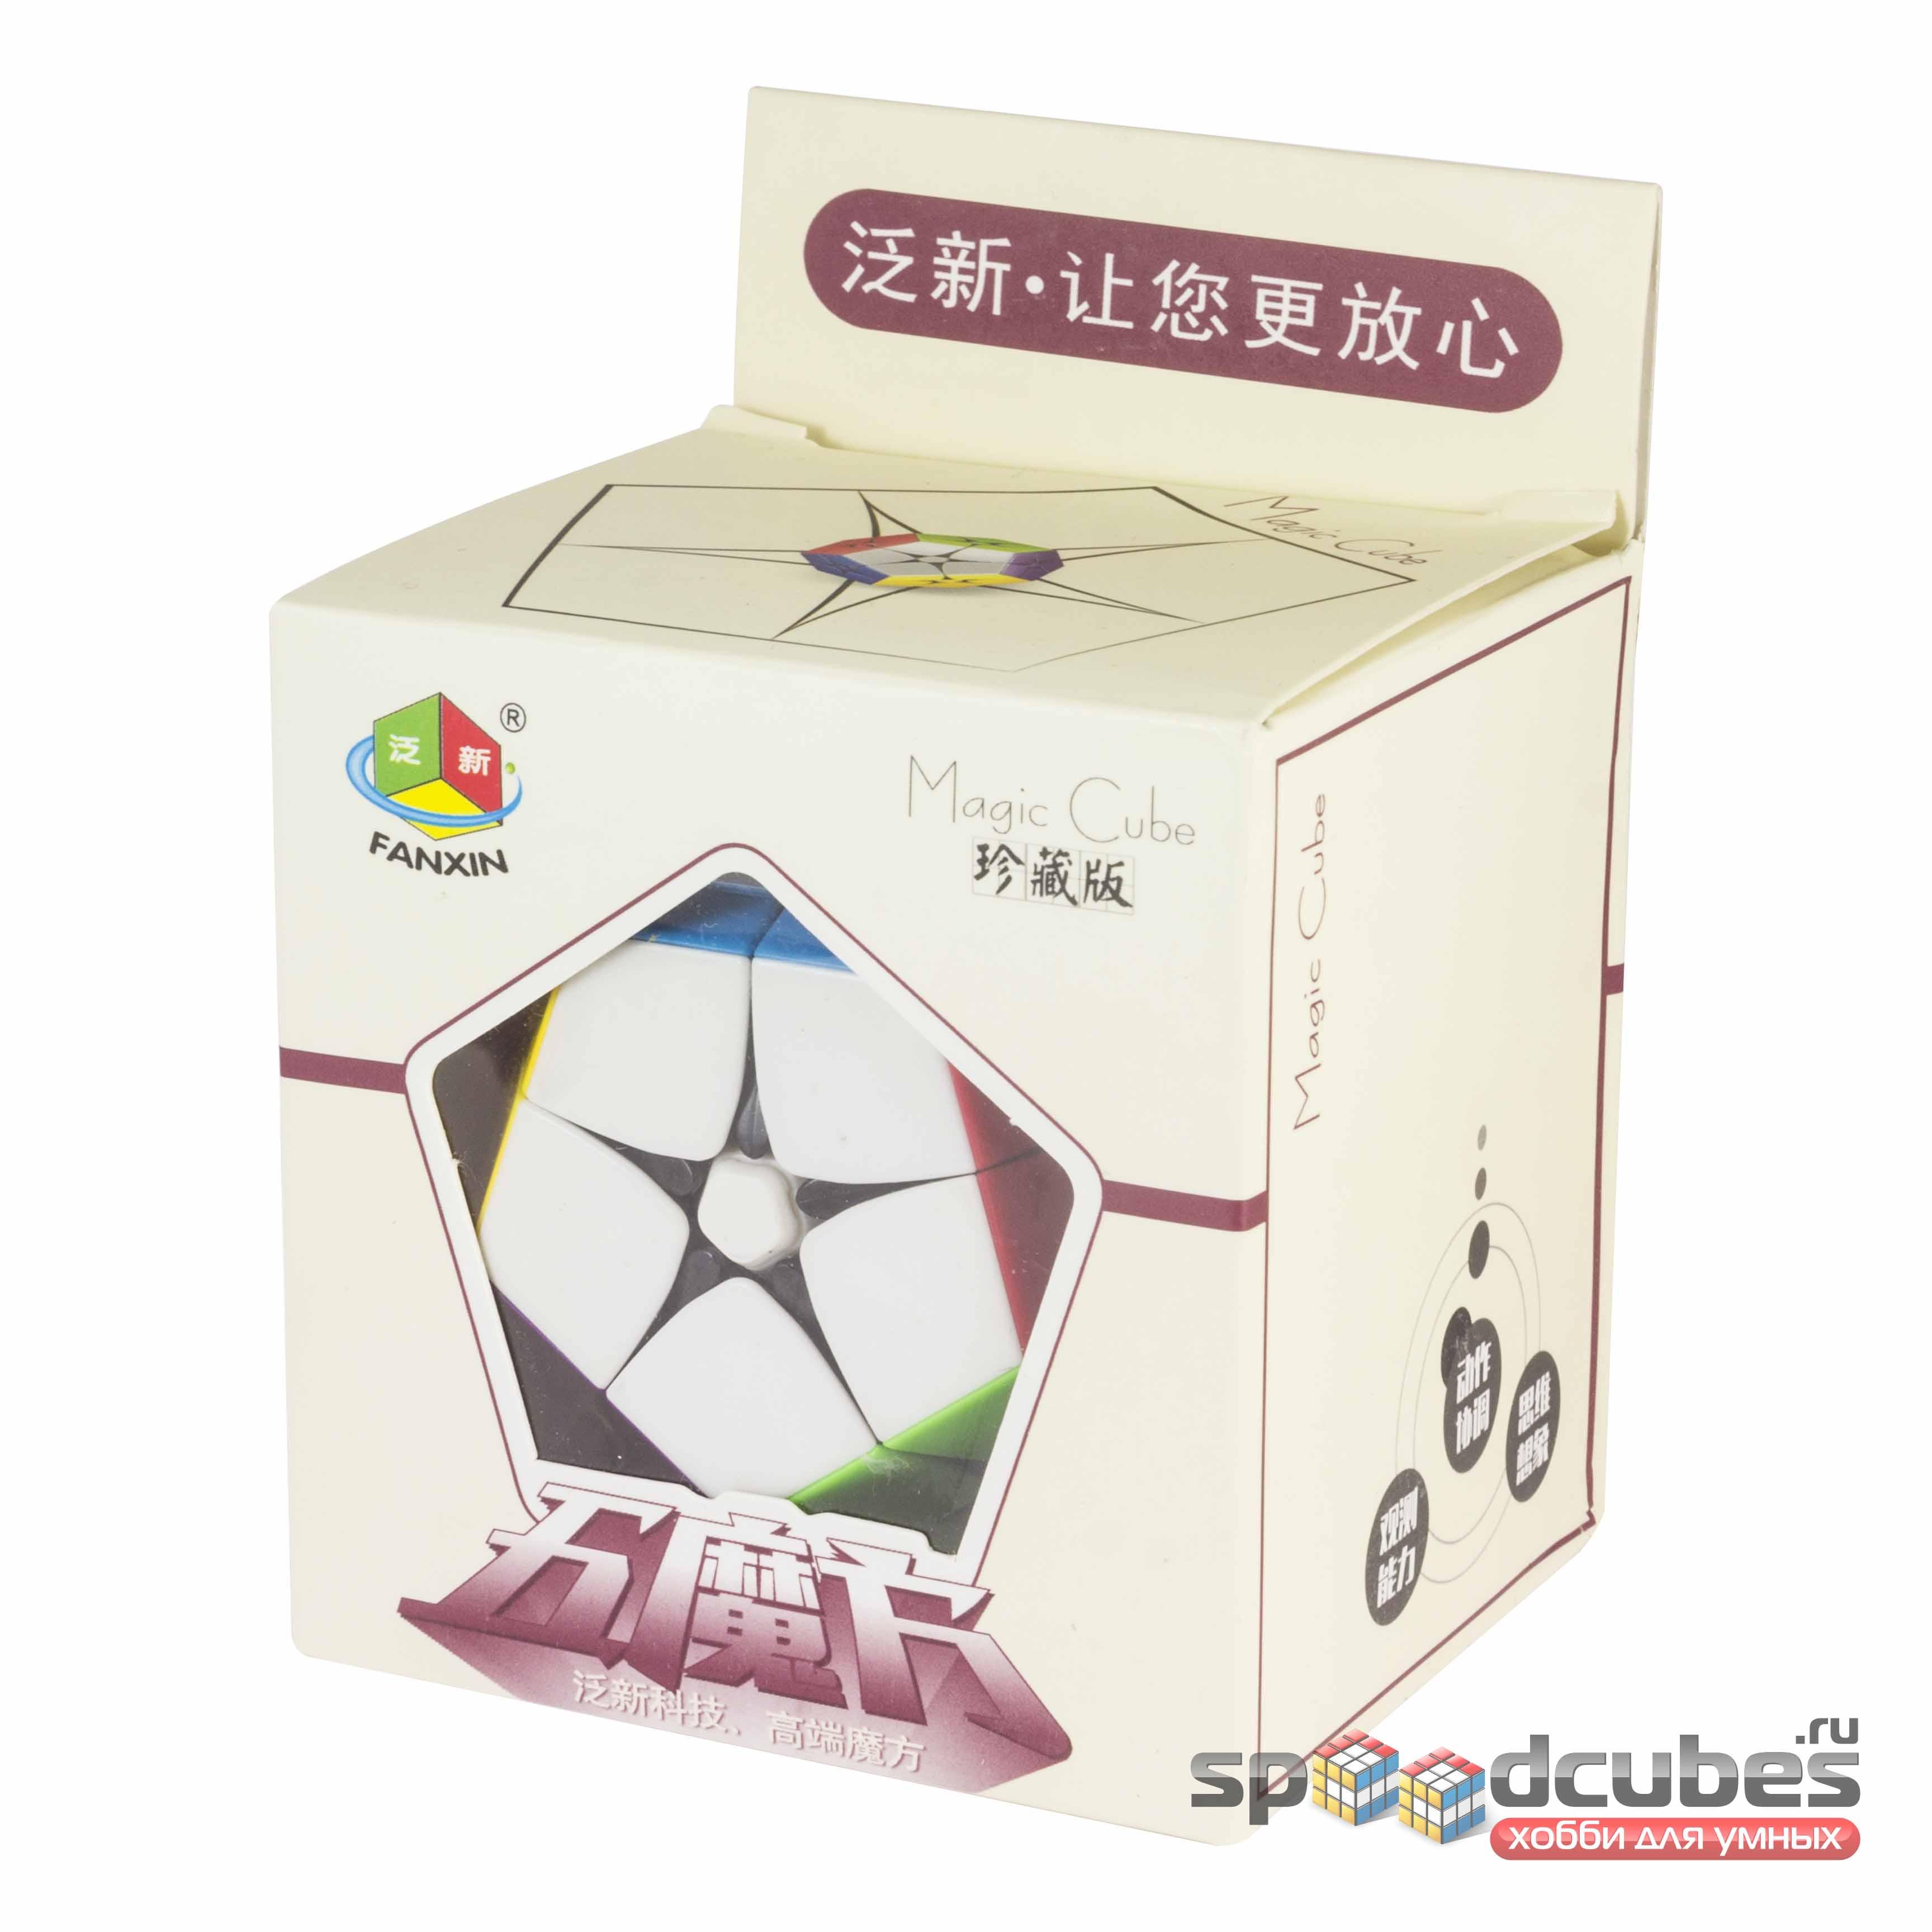 Fanxin Megaminx (Kilominx) 2×2 3